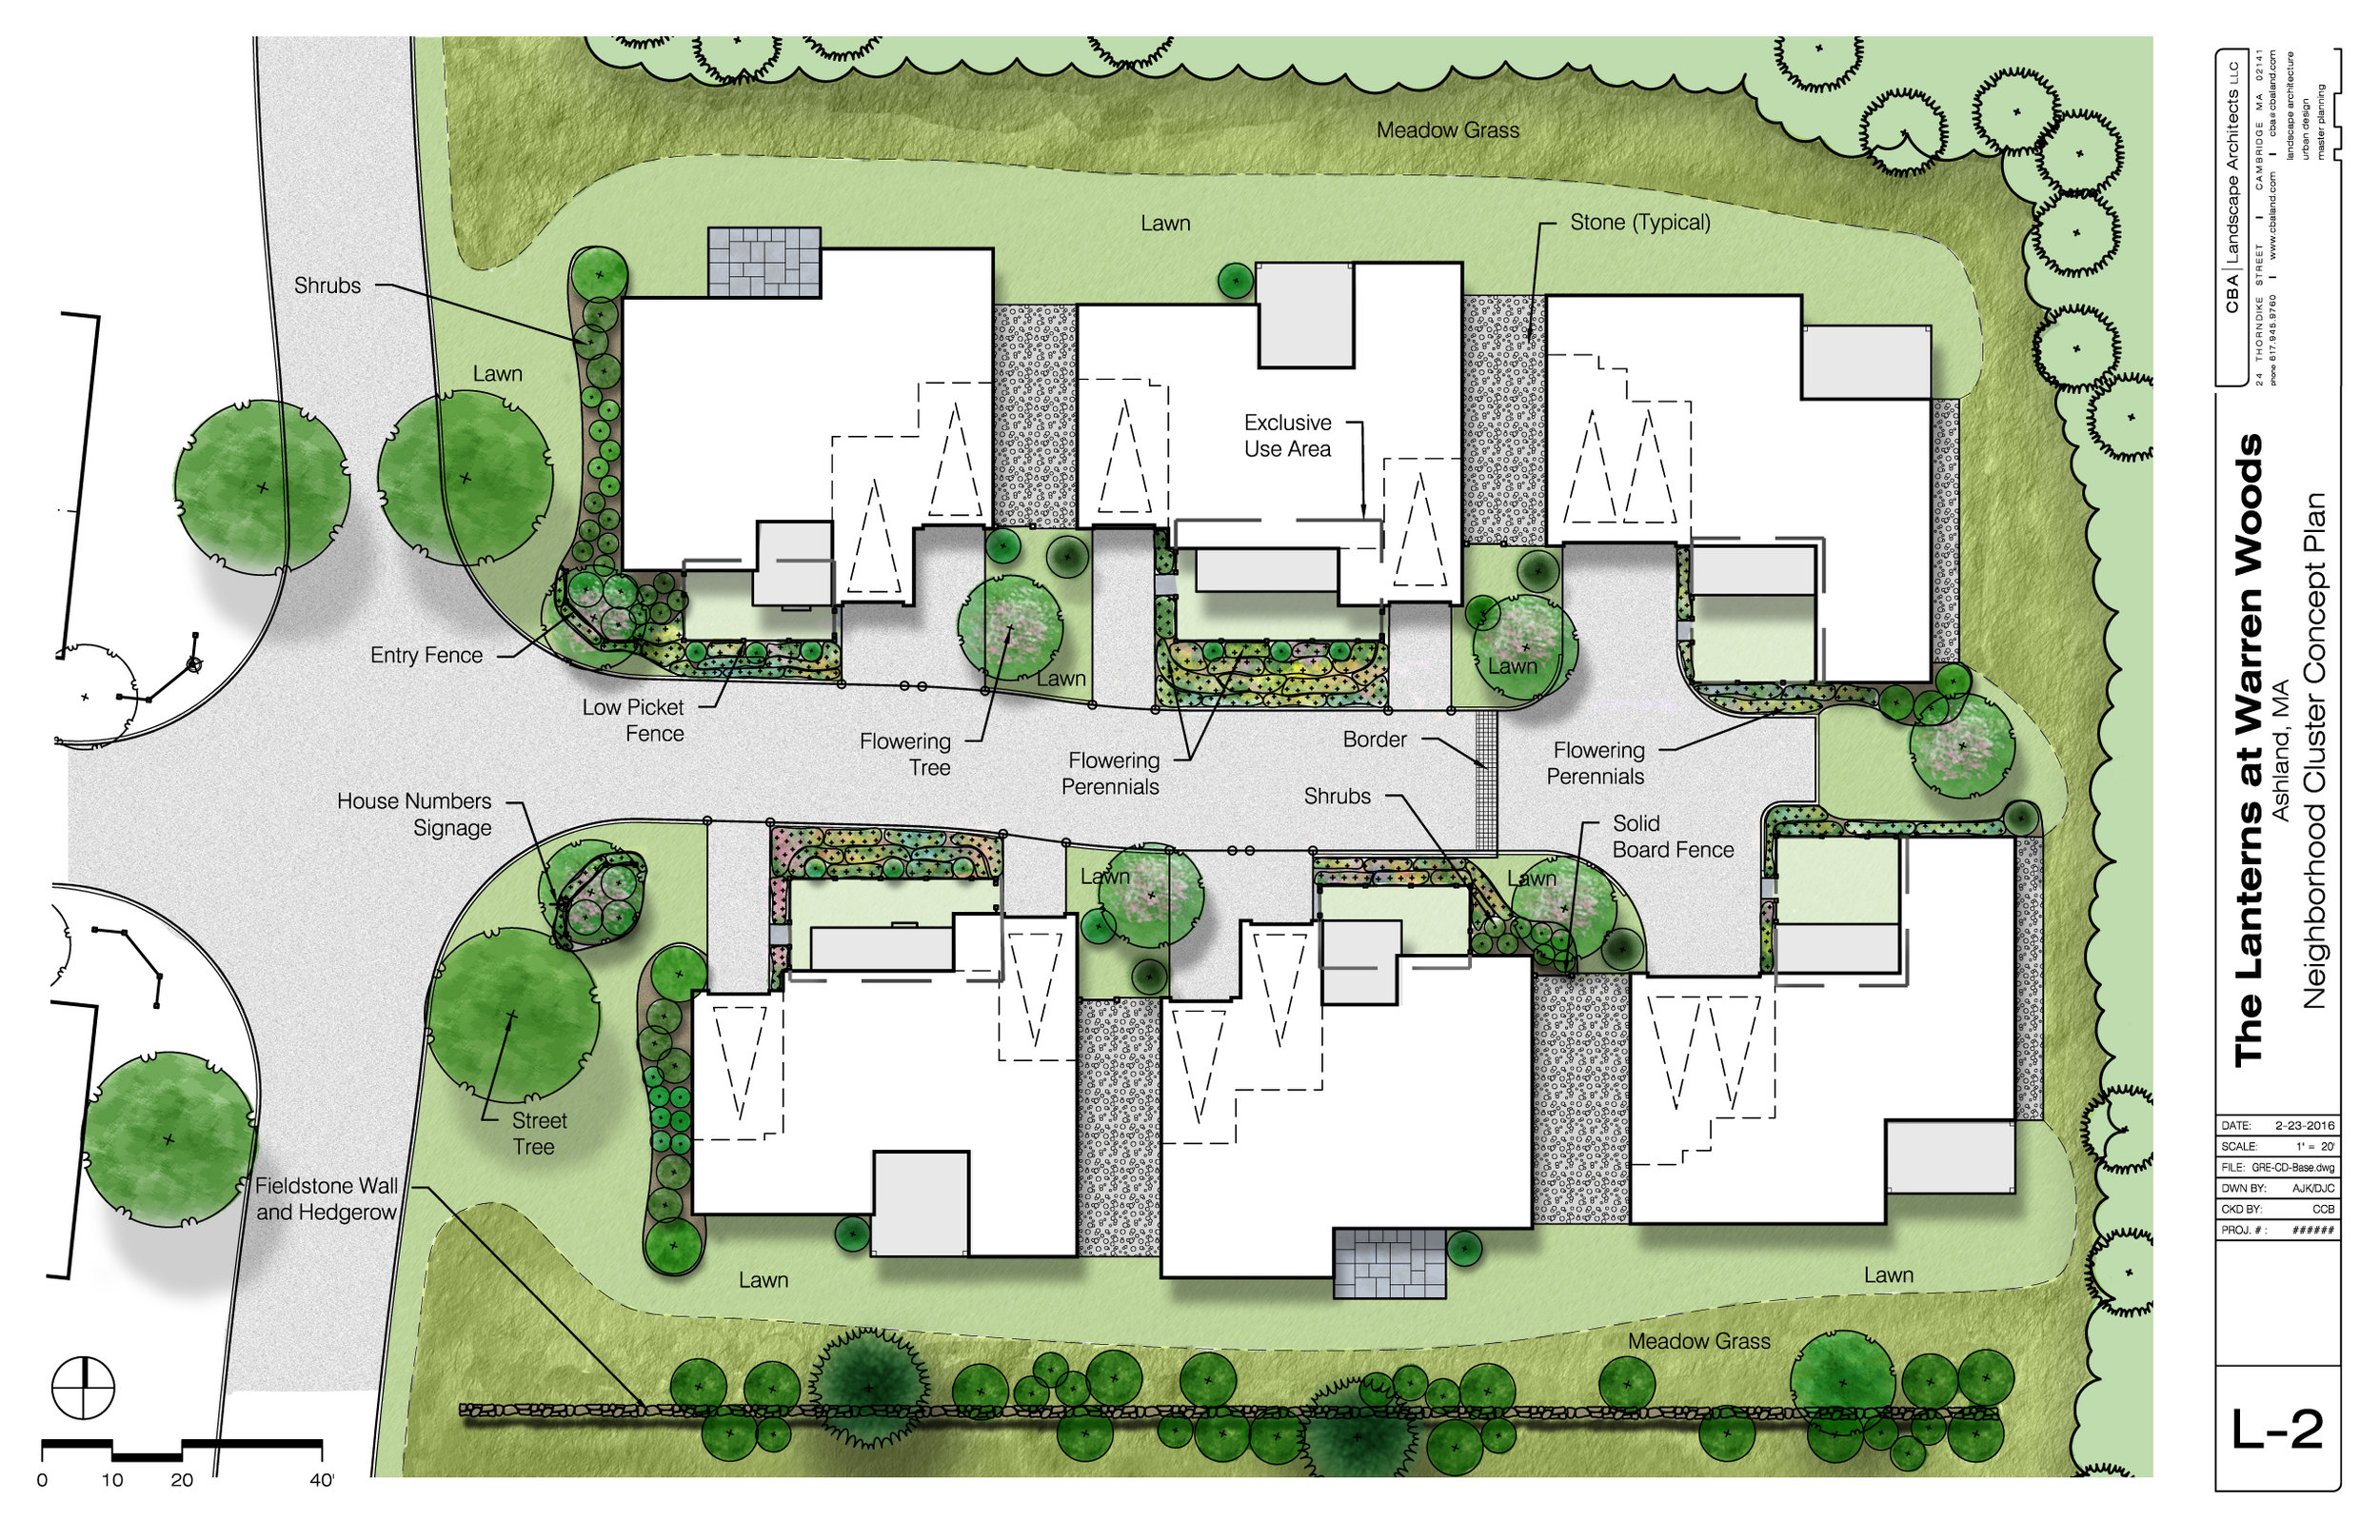 Neighborhood Cluster Concept Plan_2016-2-23.jpg